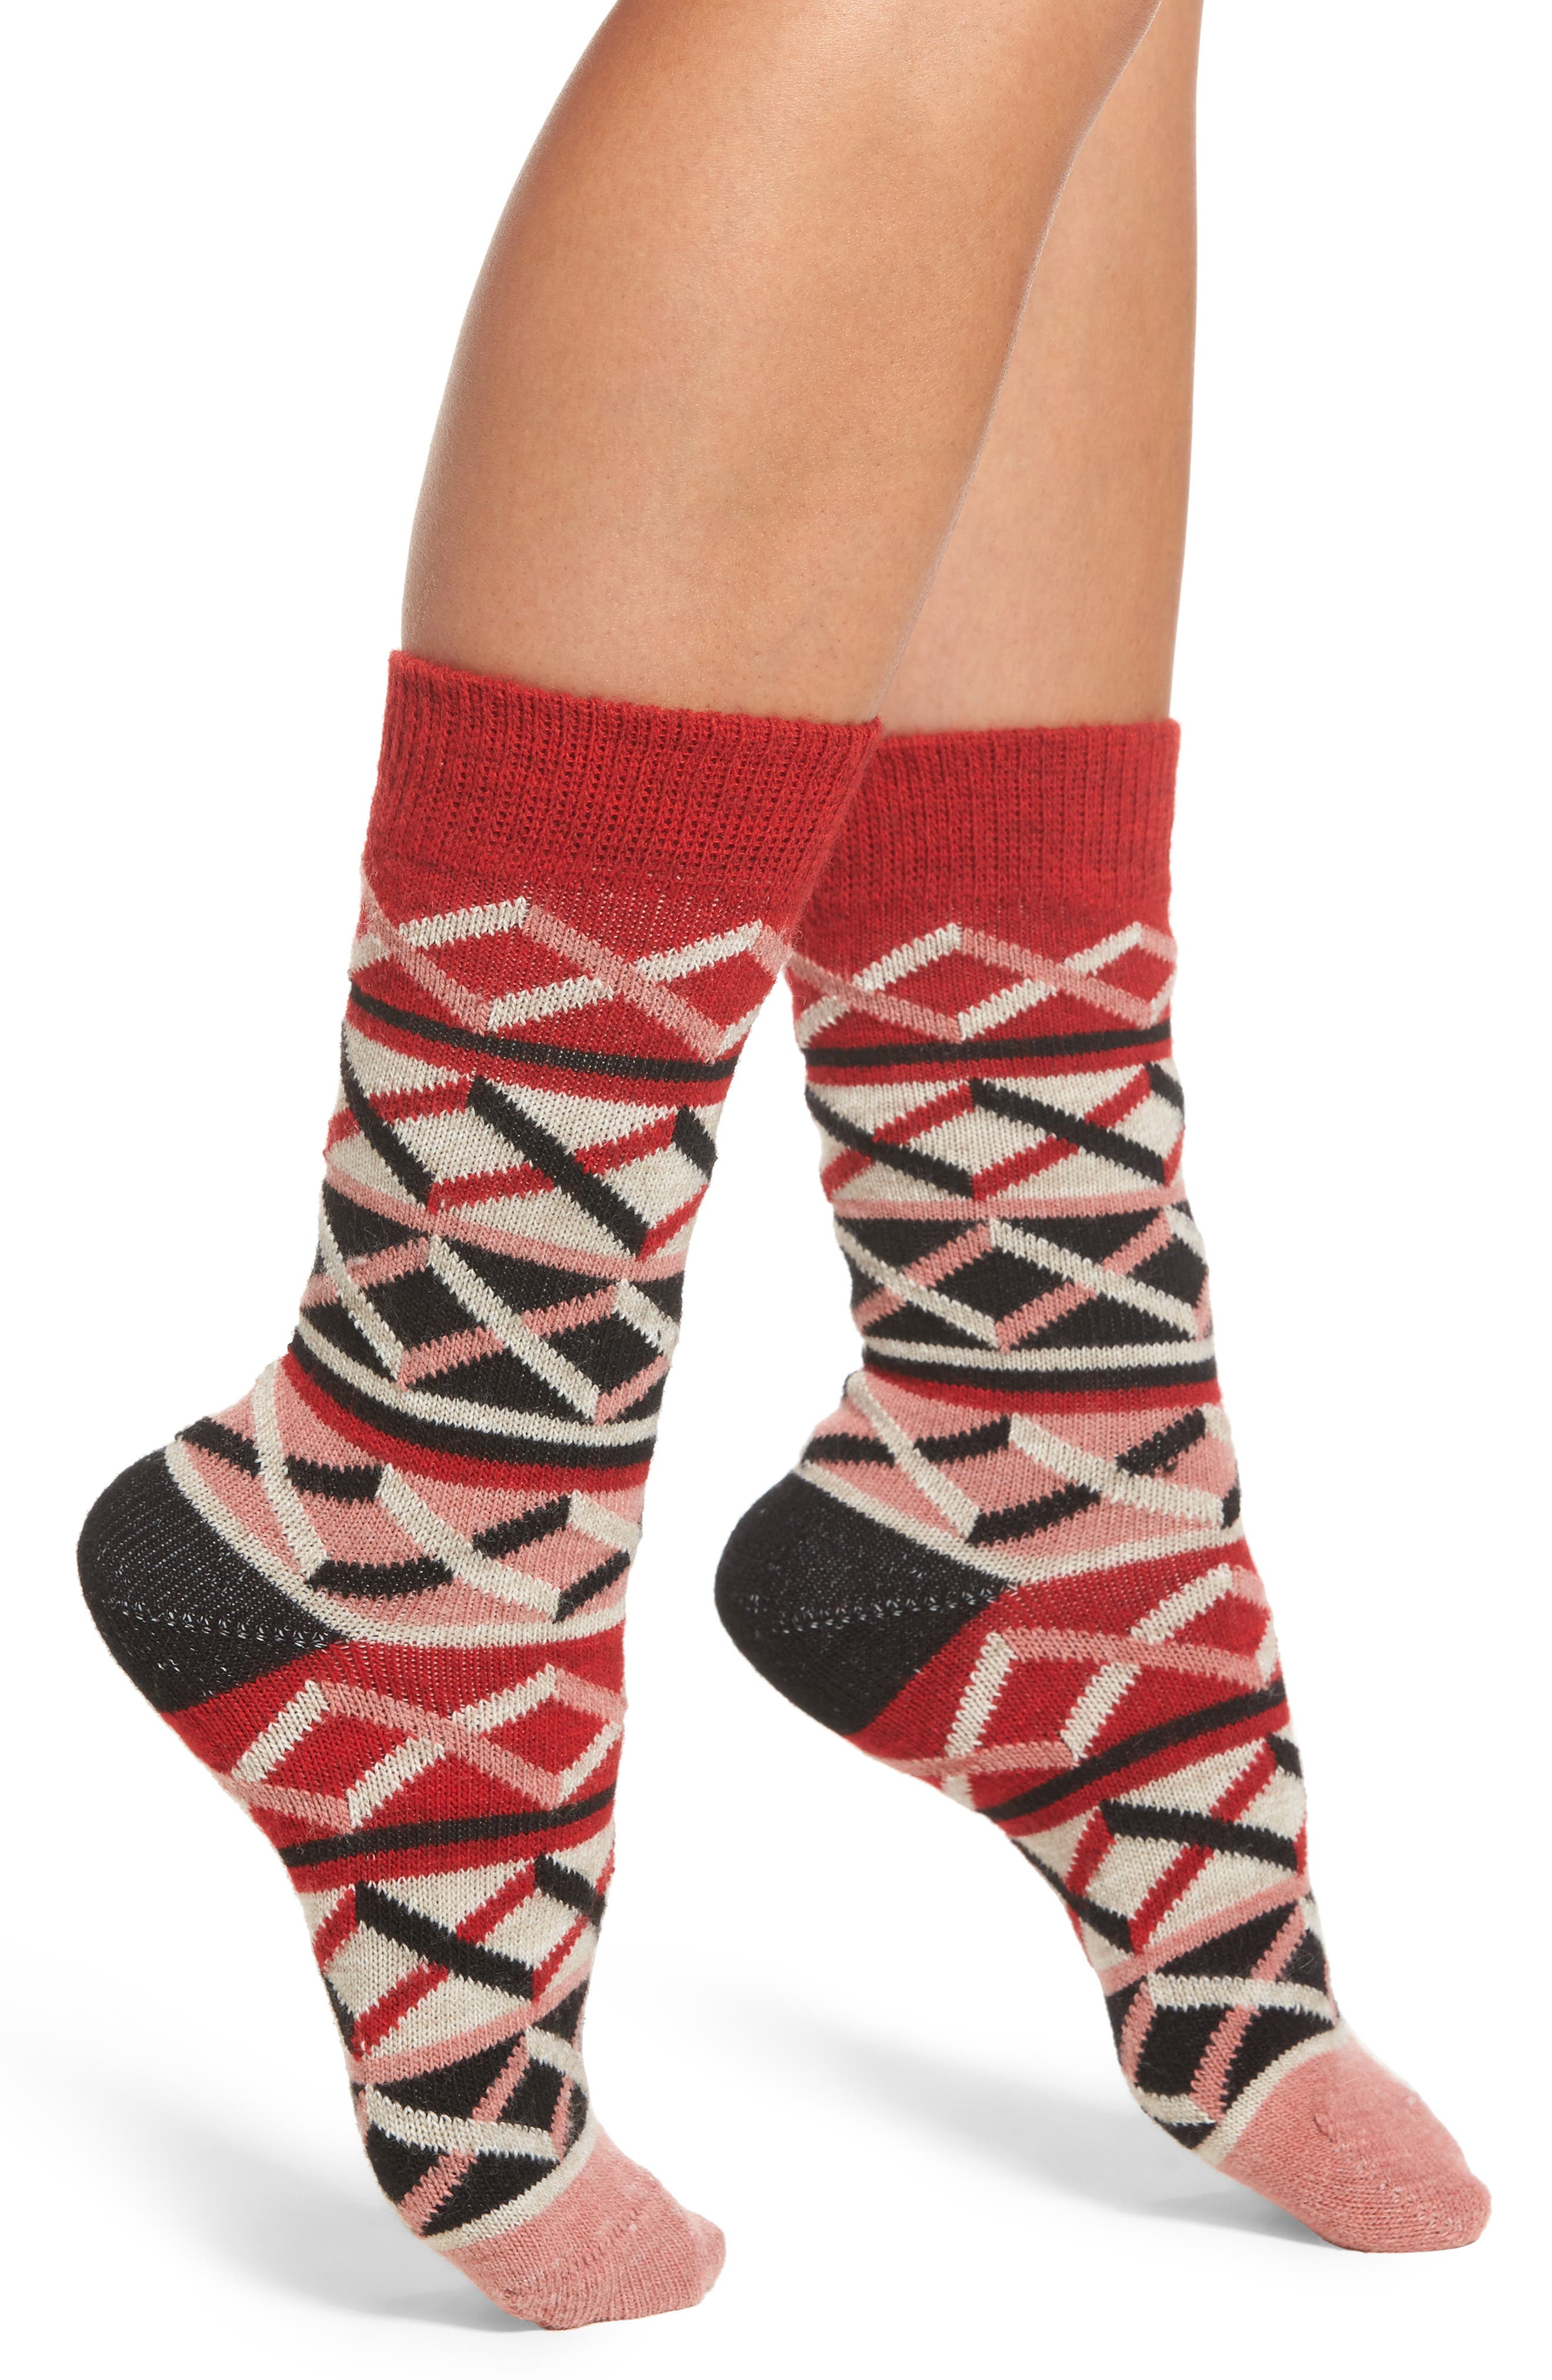 Ellinor Crew Socks,                         Main,                         color, Red